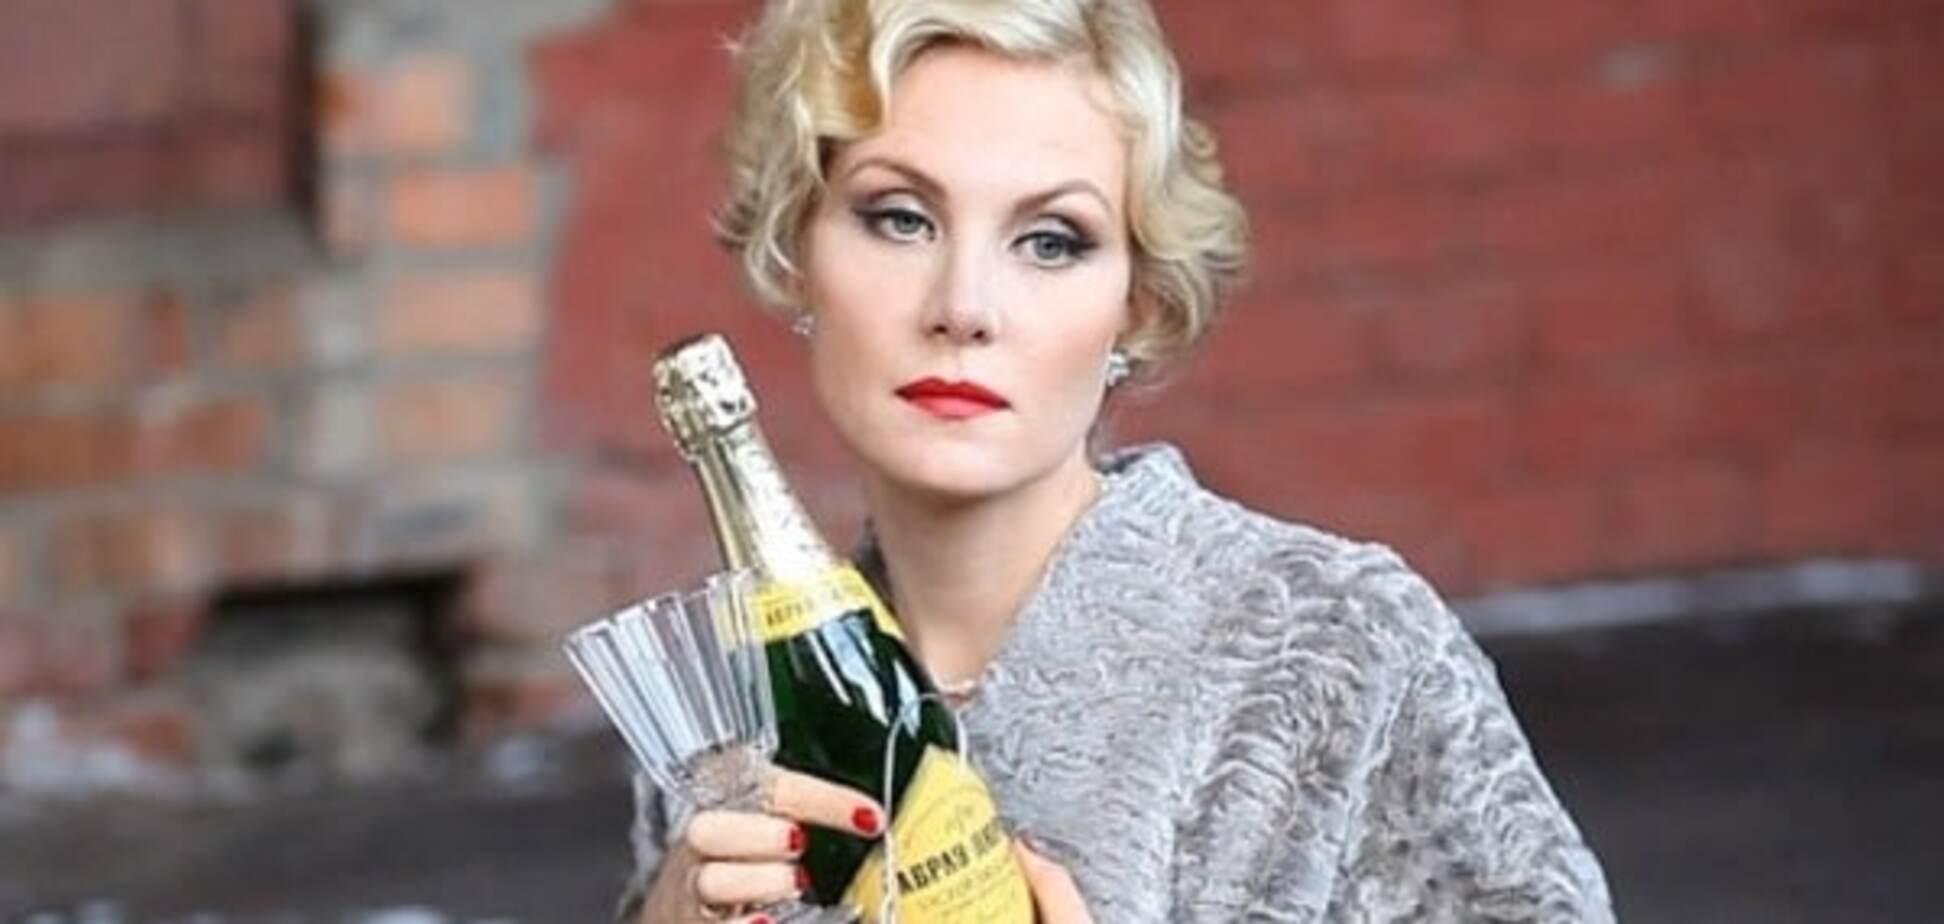 Рената Литвинова упала под стол на вечеринке в Москве